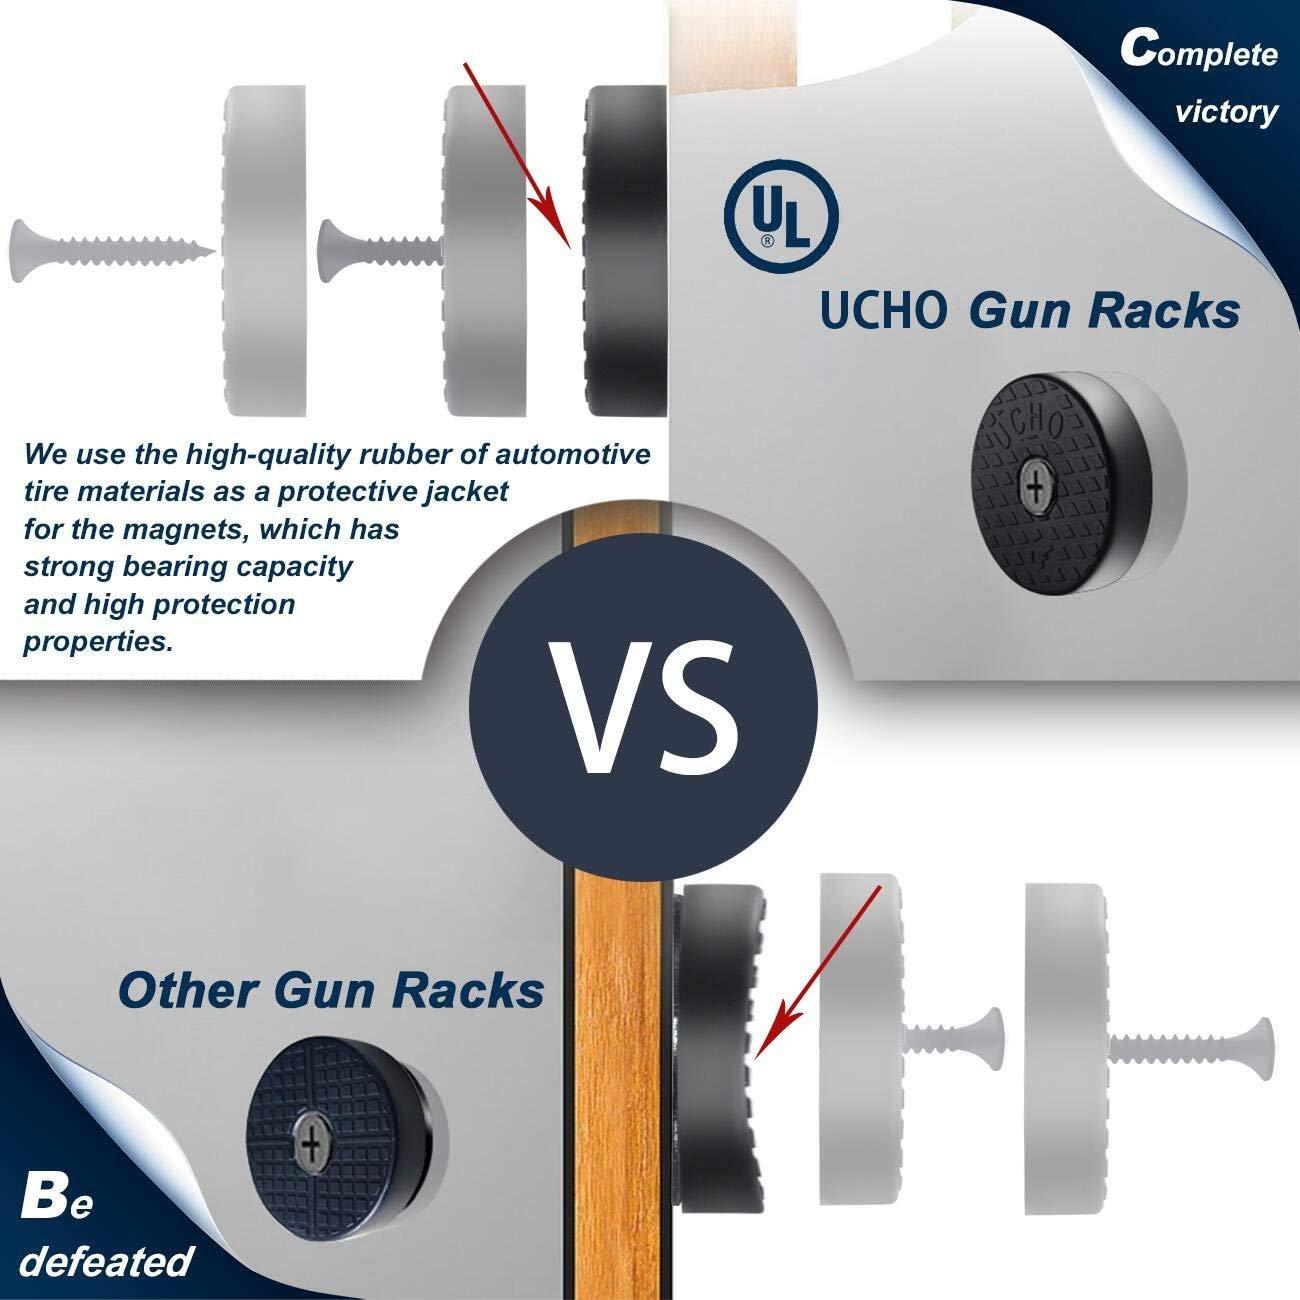 889c79f61 Amazon.com : UCHO Officreative Gun Magnet Mount - Coated Magnetic Gun Mount  & Holster, Concealed Holder for Handgun, Rifle, Shotgun, Pistol, Revolver,  ...